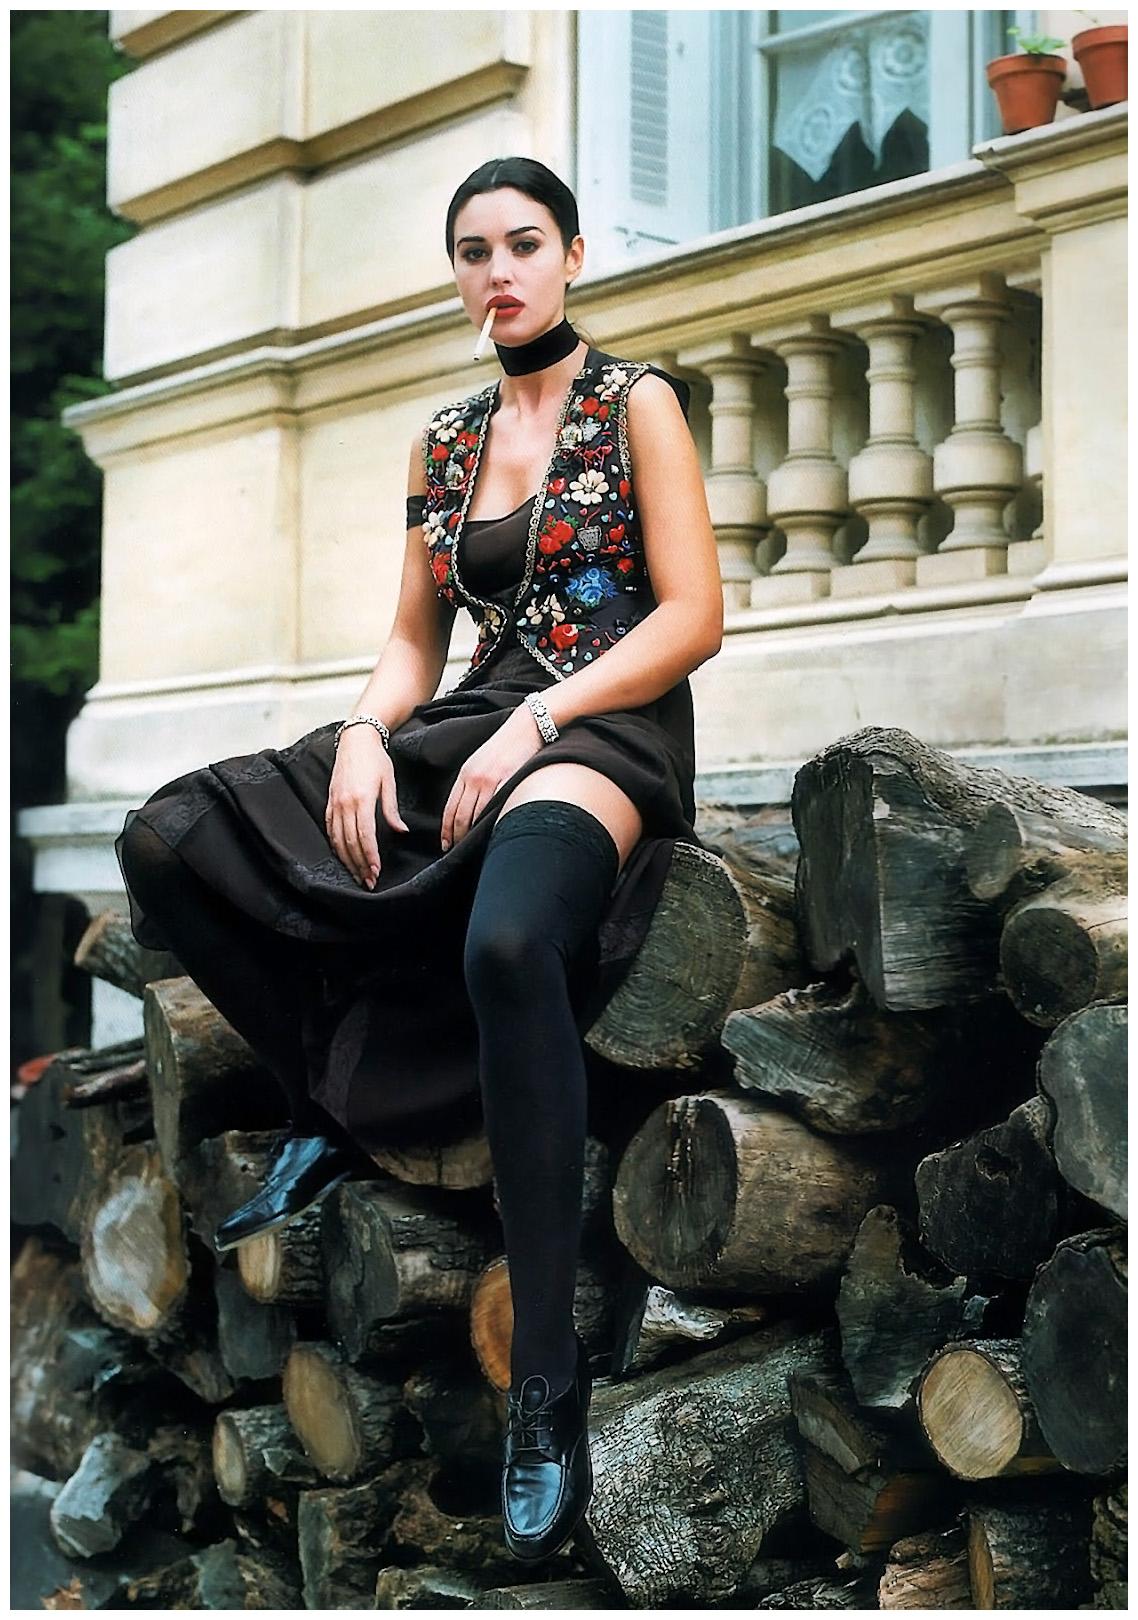 Young Nikita Bellucci nude (74 photos), Topless, Paparazzi, Boobs, cleavage 2006